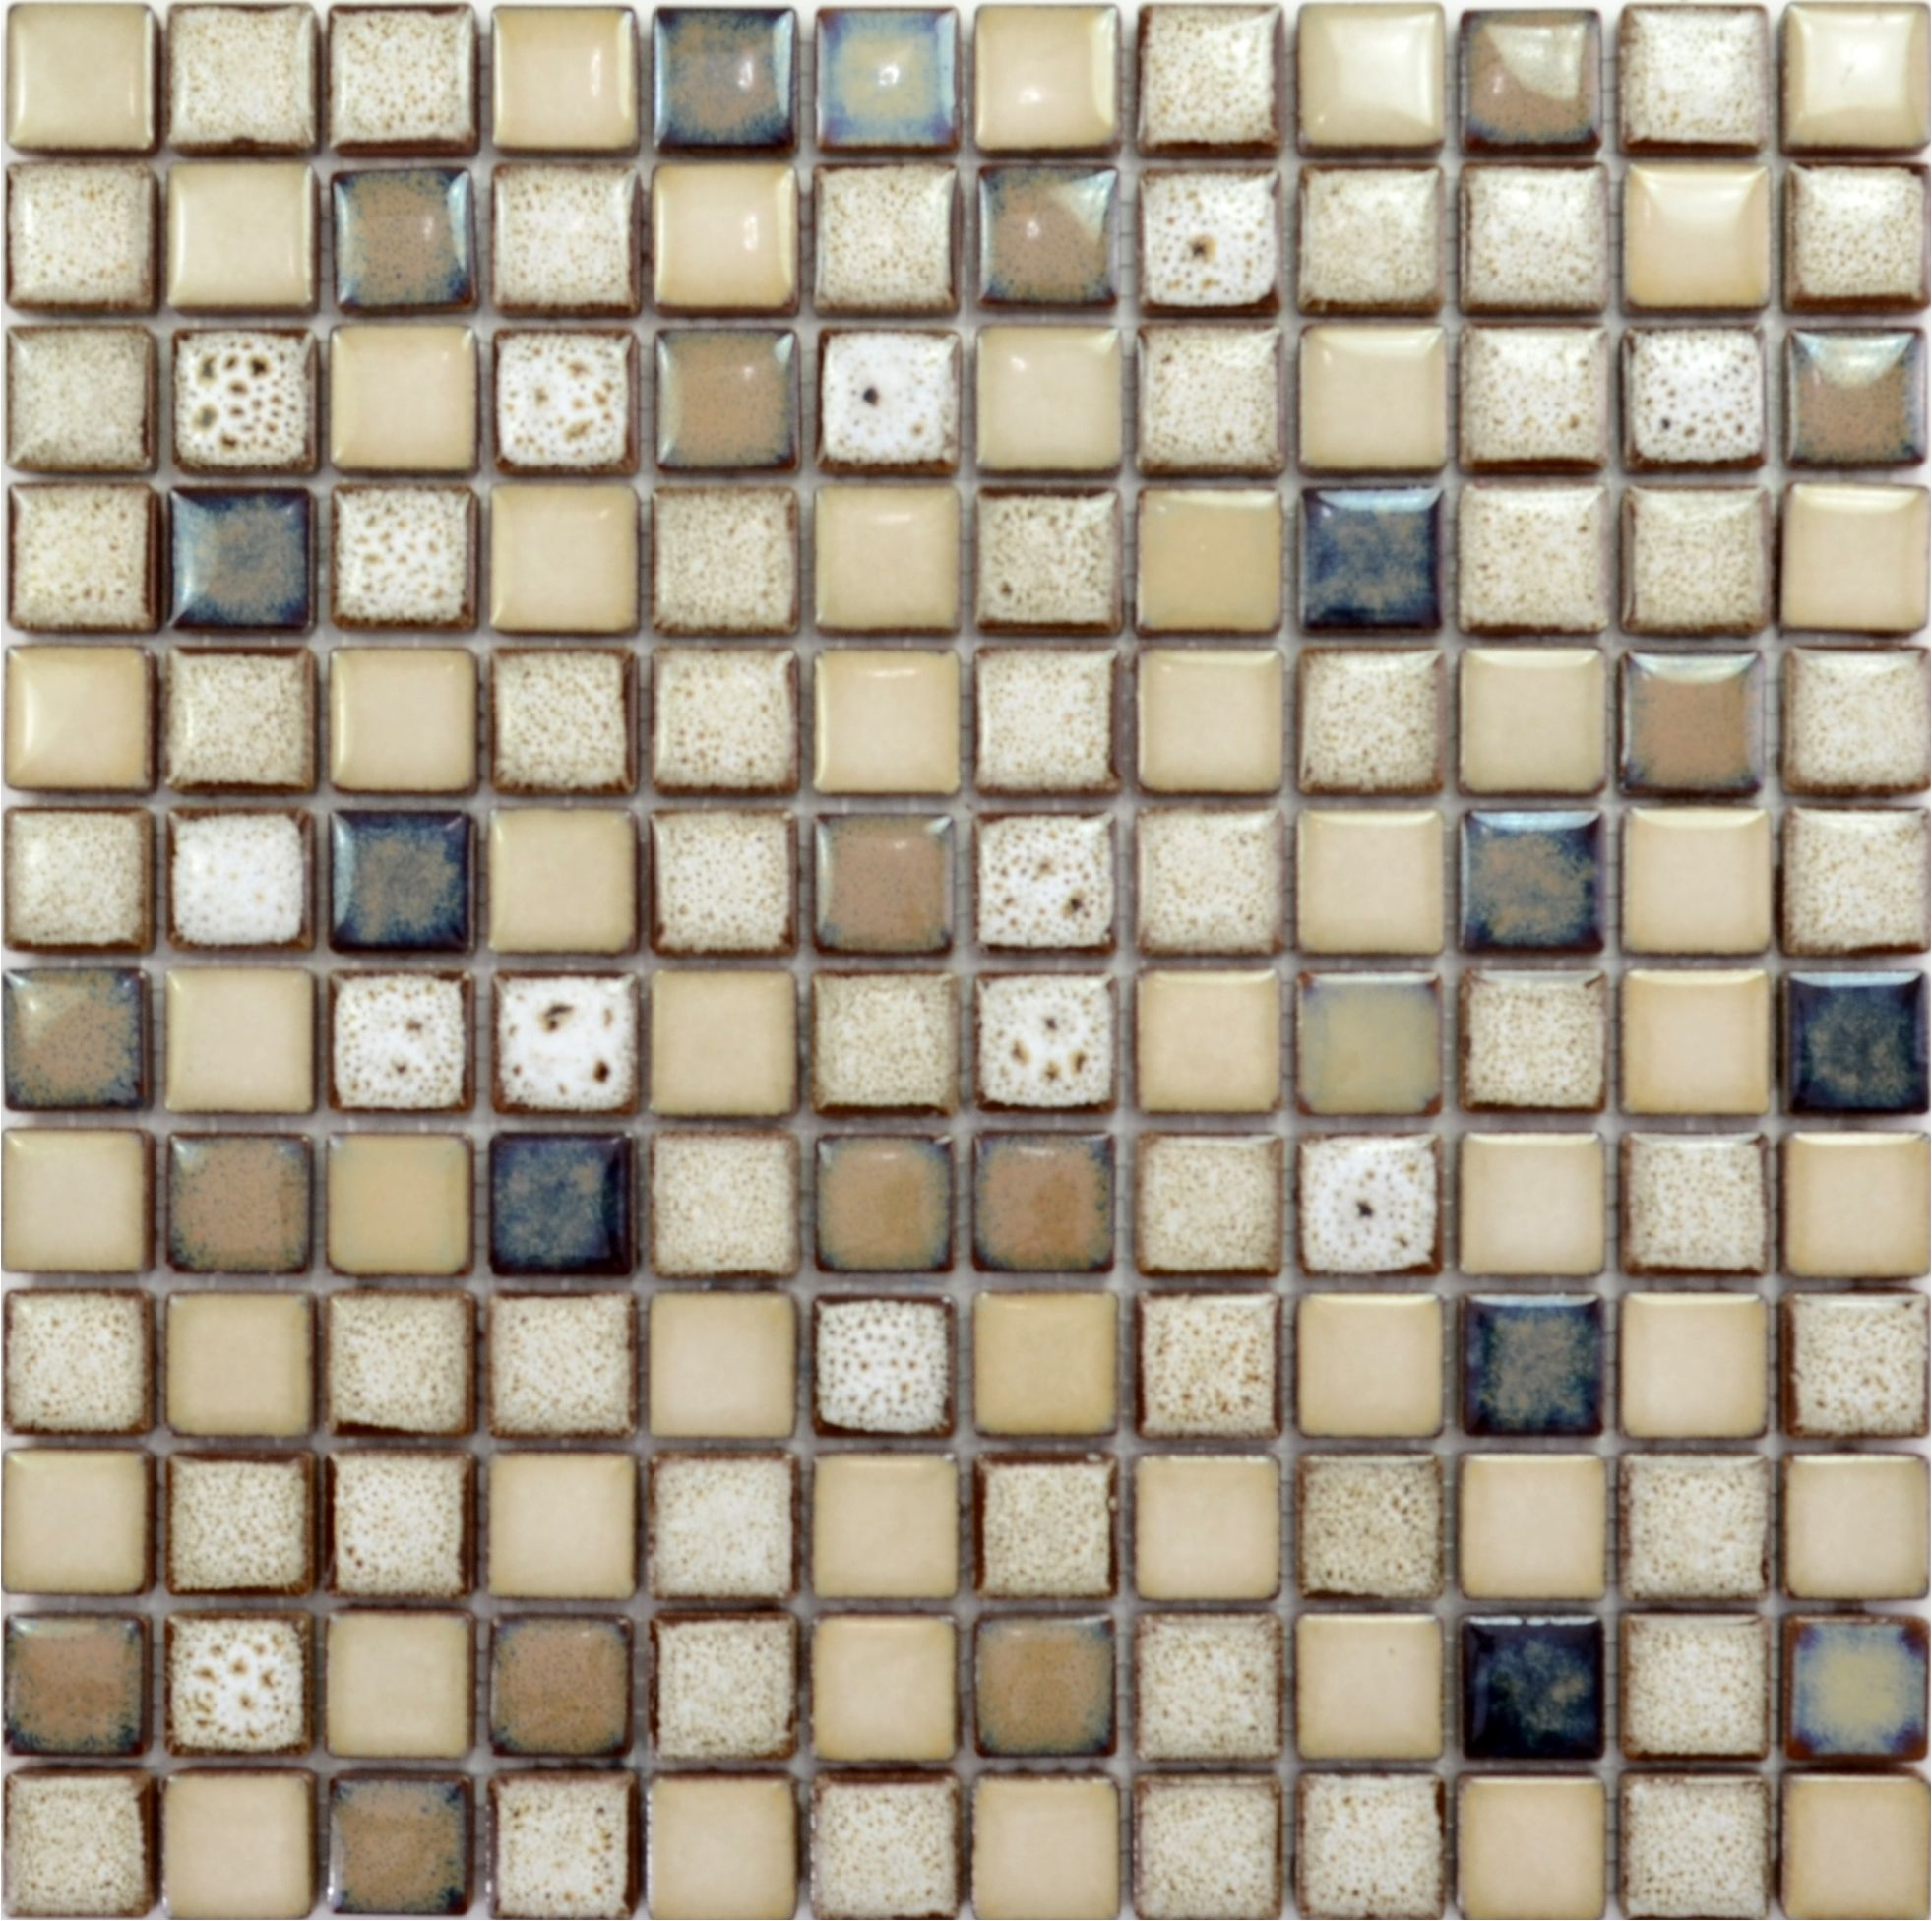 Porcelain Mosaic Tile Kitchen Backsplash Mosaic Flooring Porcelain Wall Tile Porcelain Mosaic